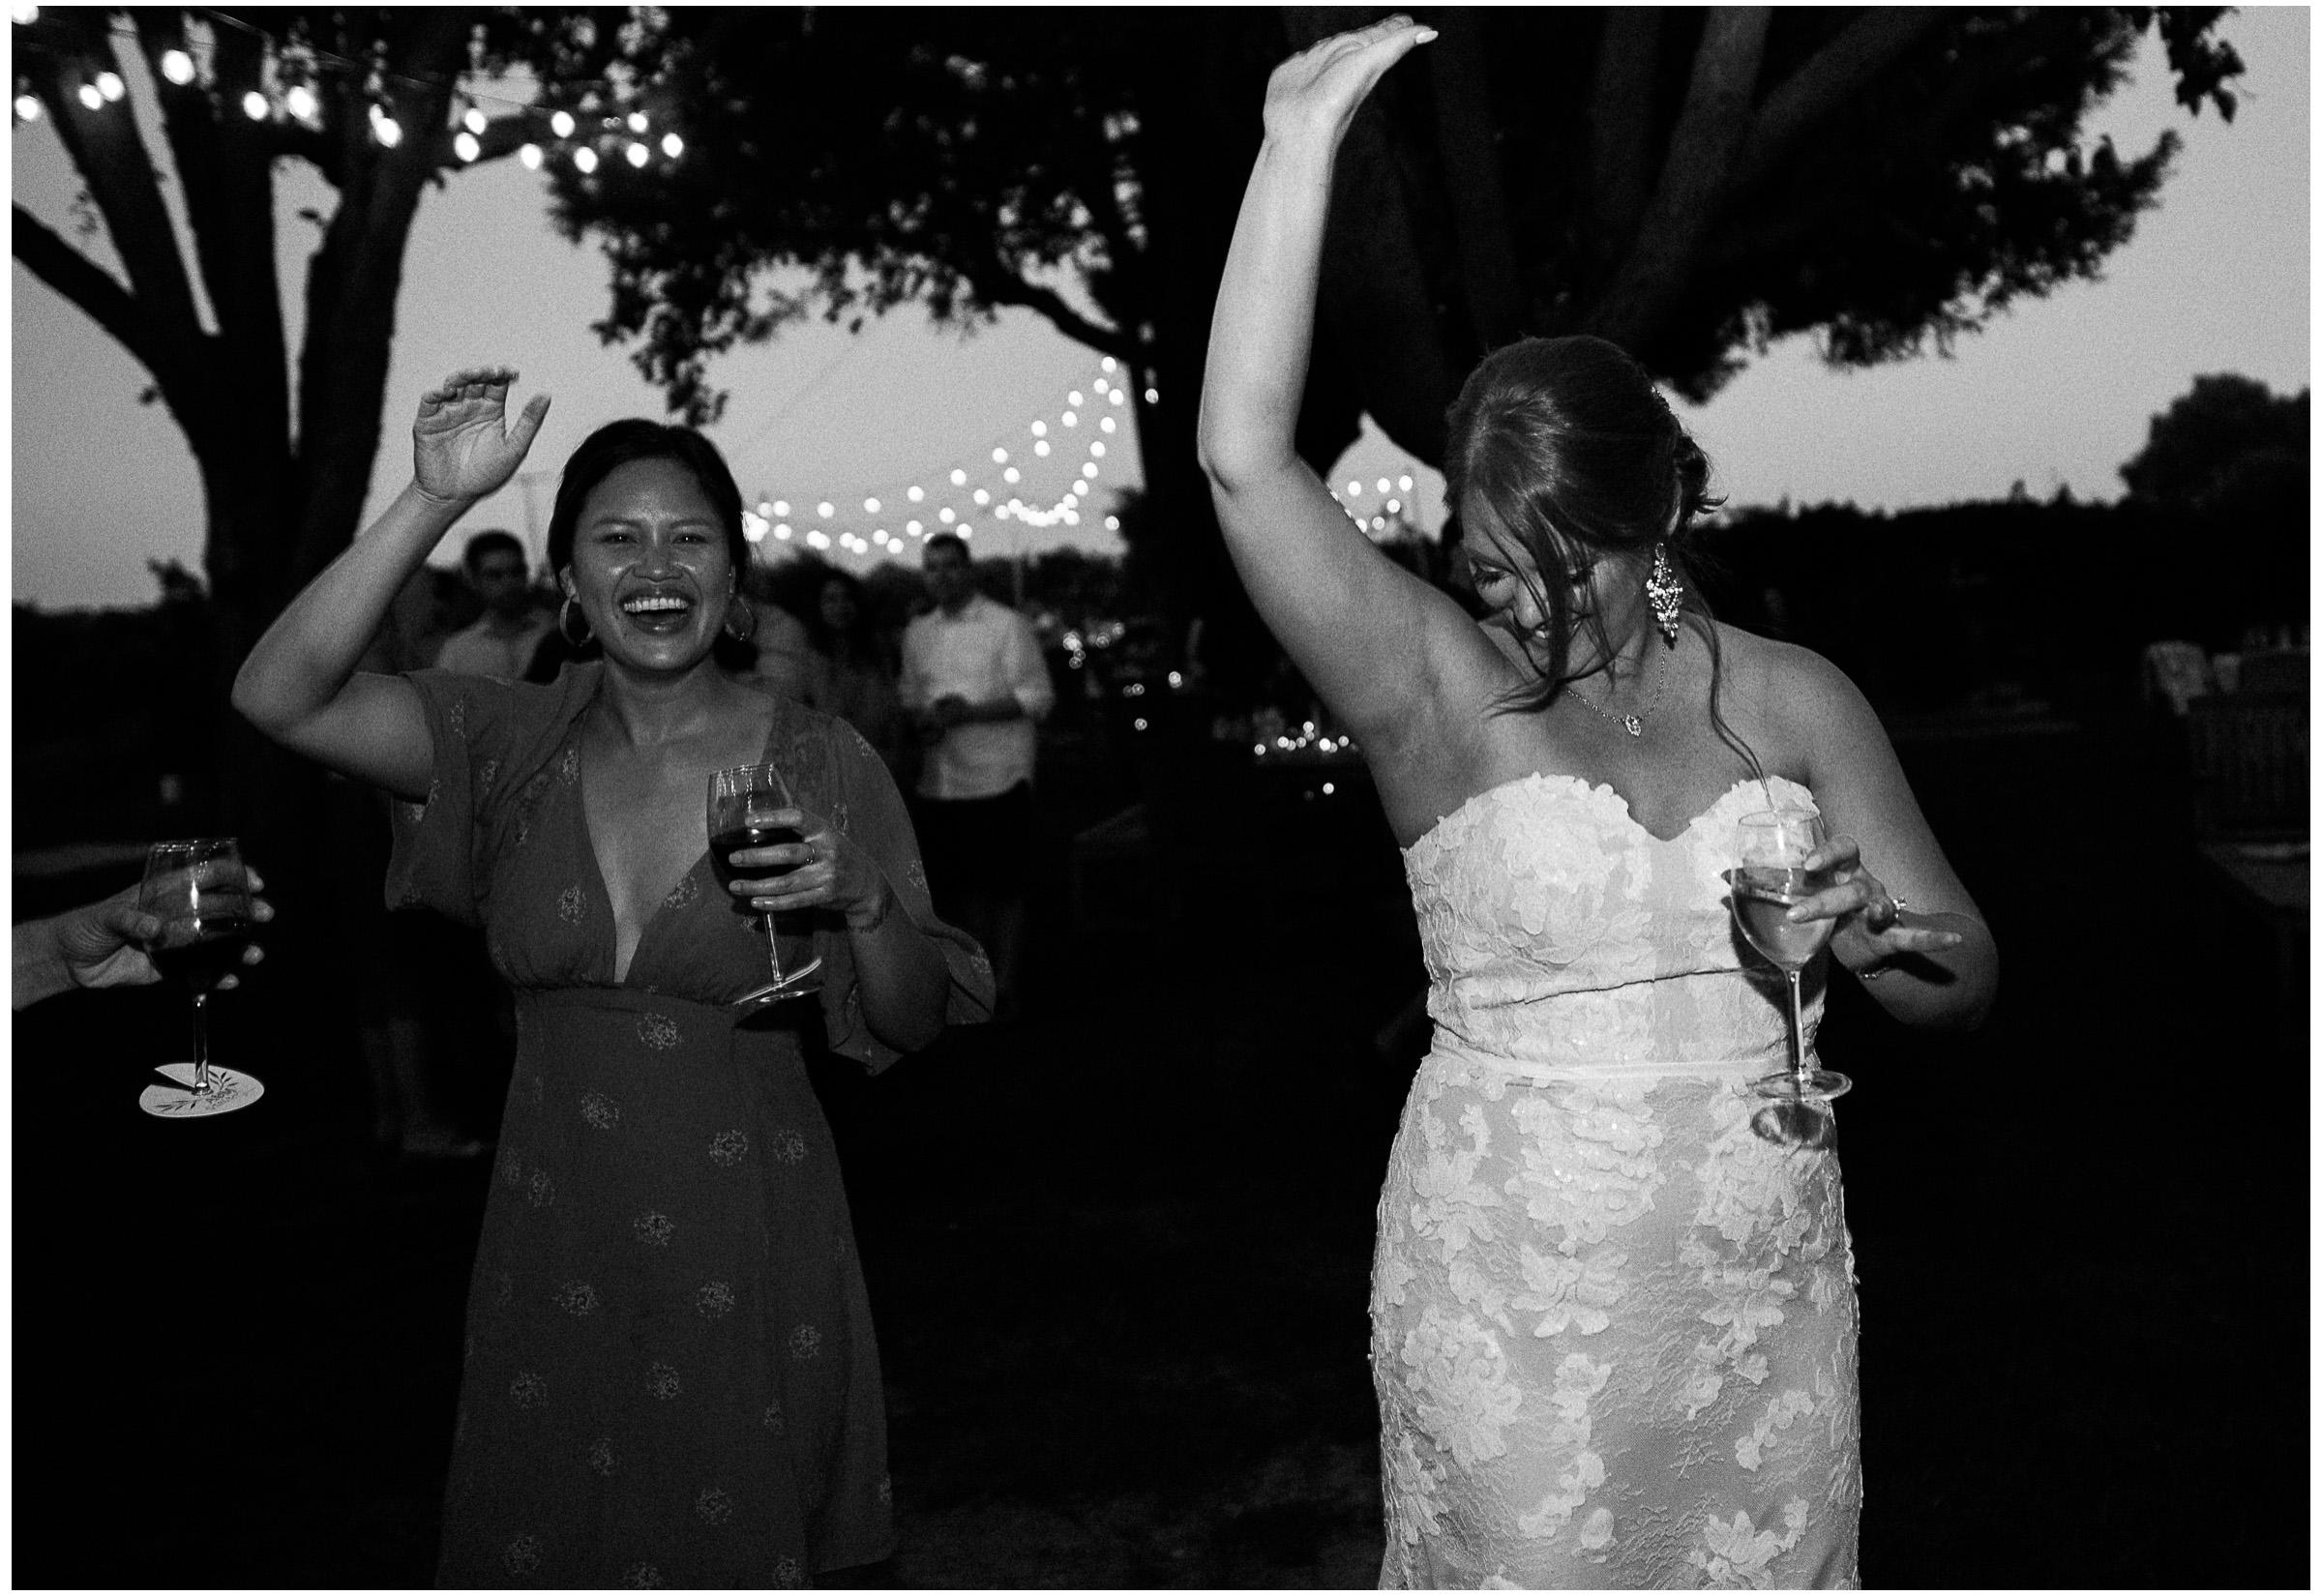 Clarksburg Wedding - Sacramento Photographer - Bogle Winery - Justin Wilcox Photography - 25.jpg